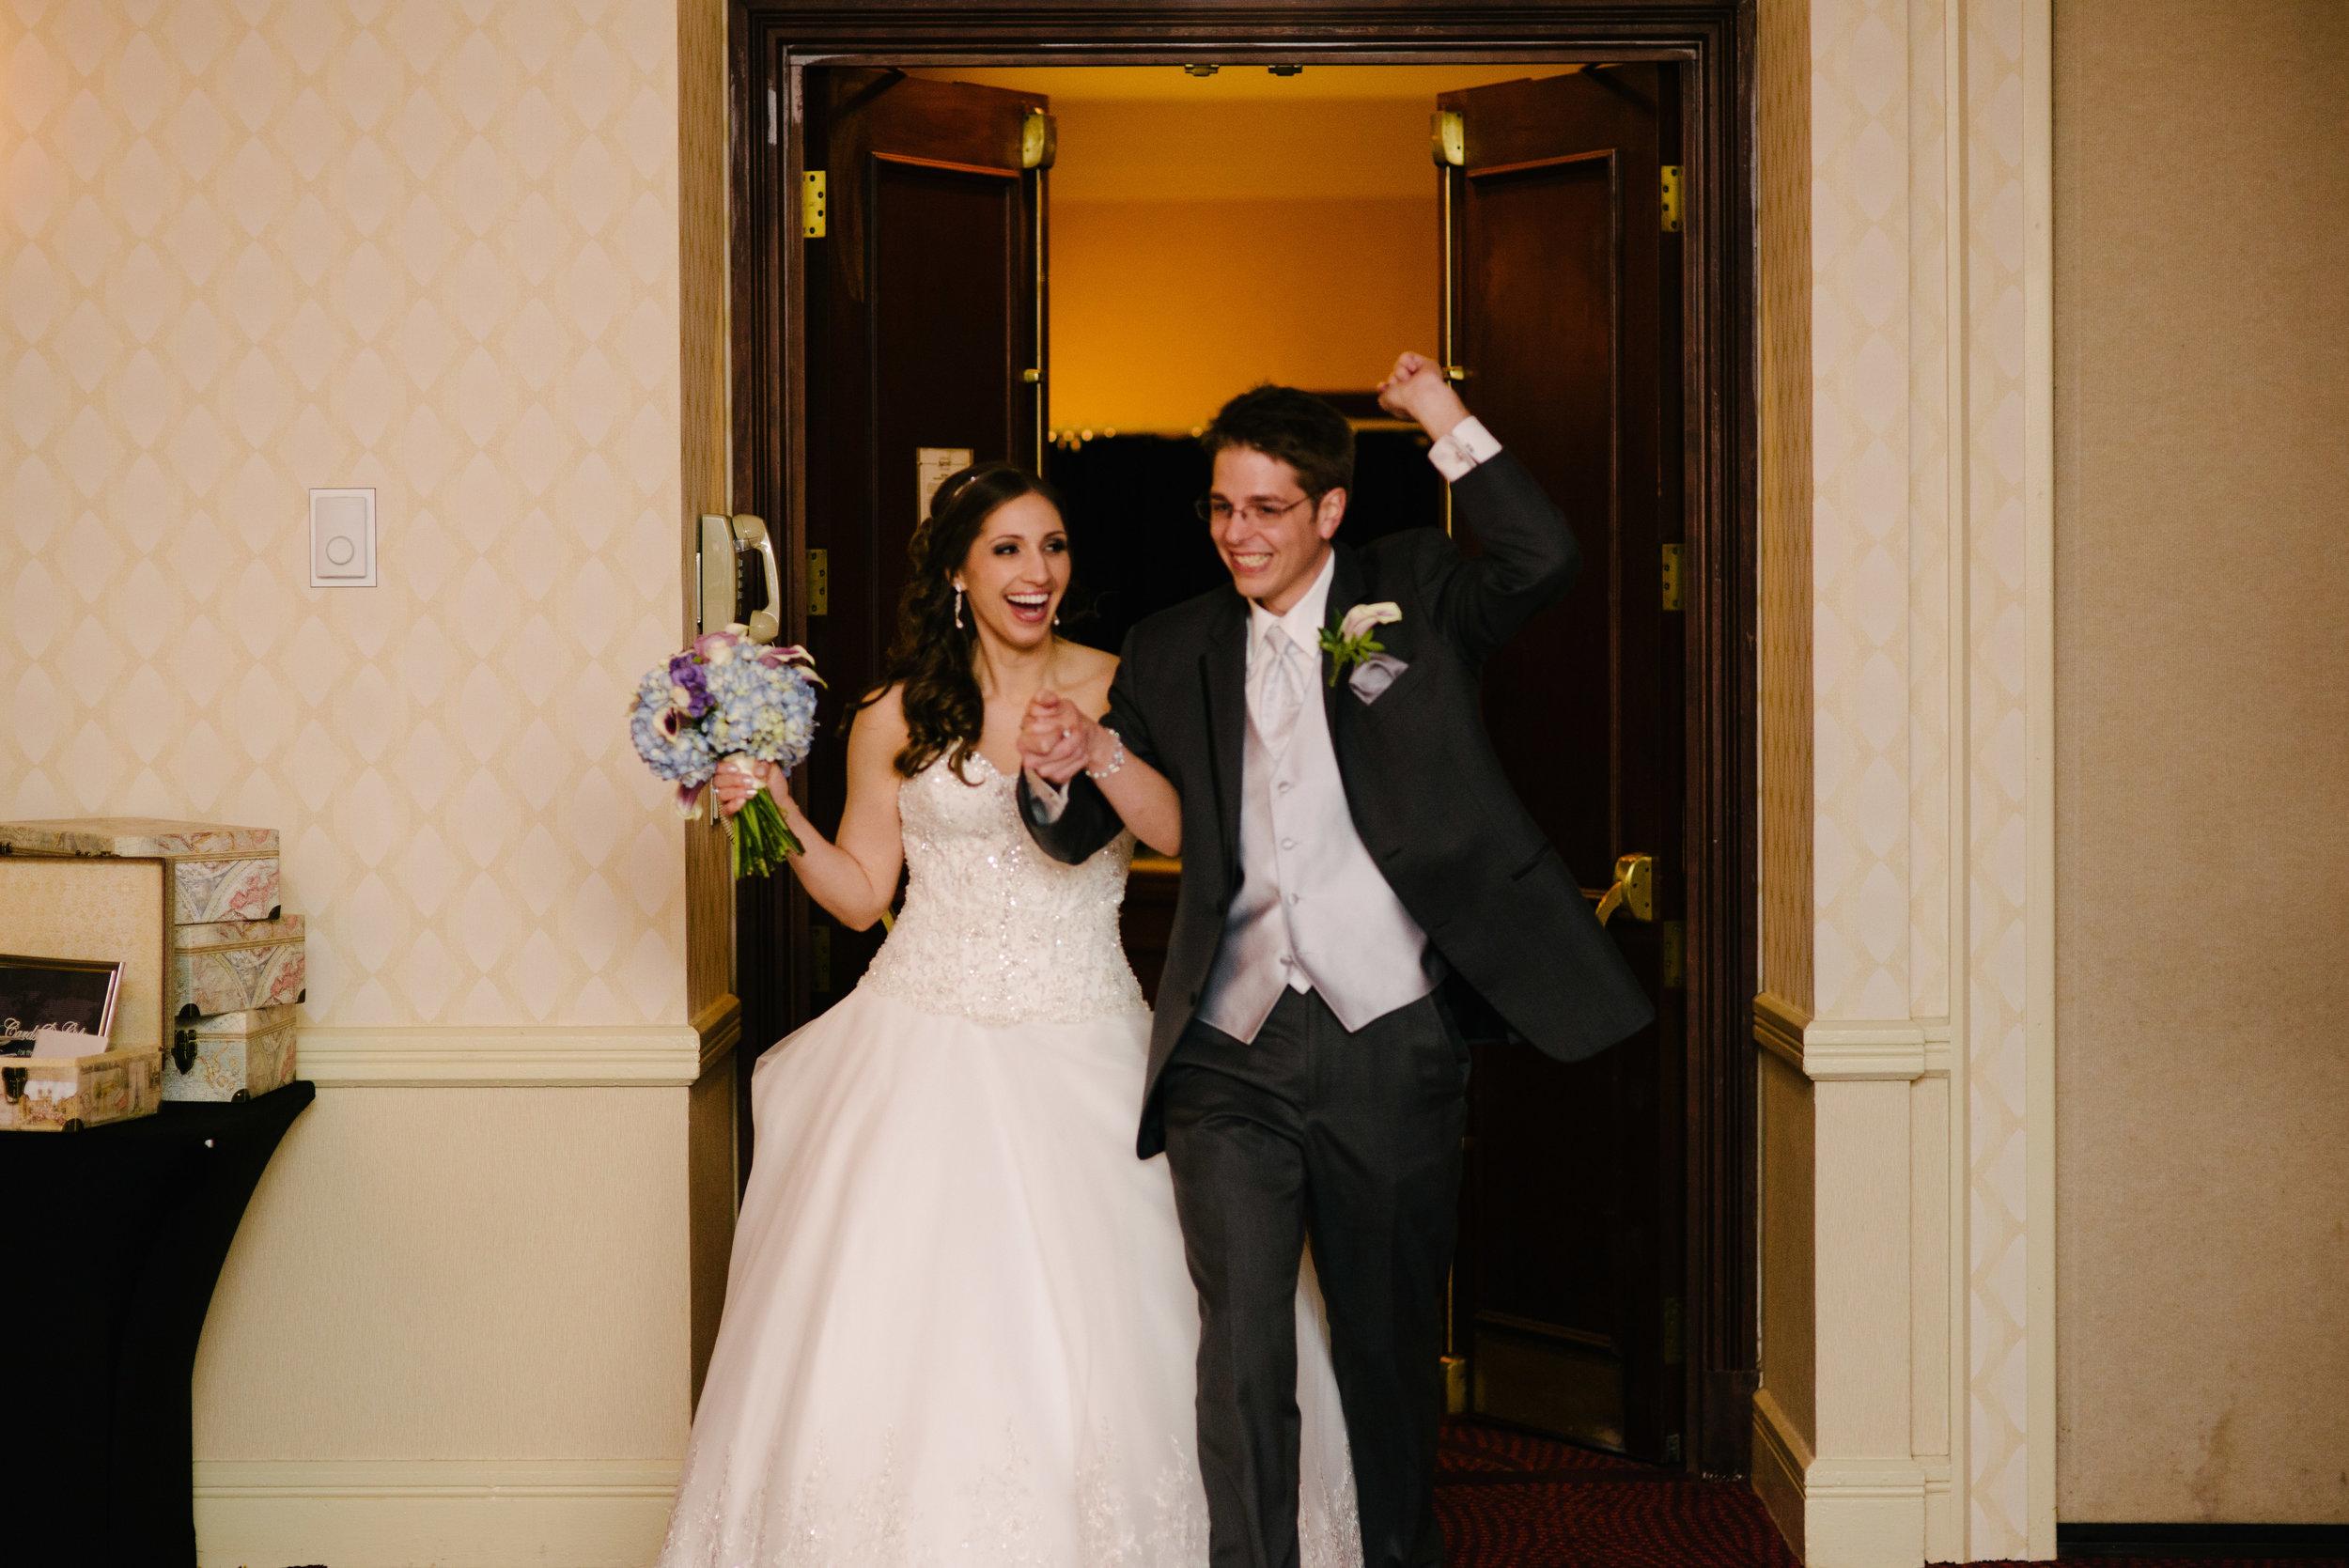 Grand entrance ballroom reception // The Miner Details weddings